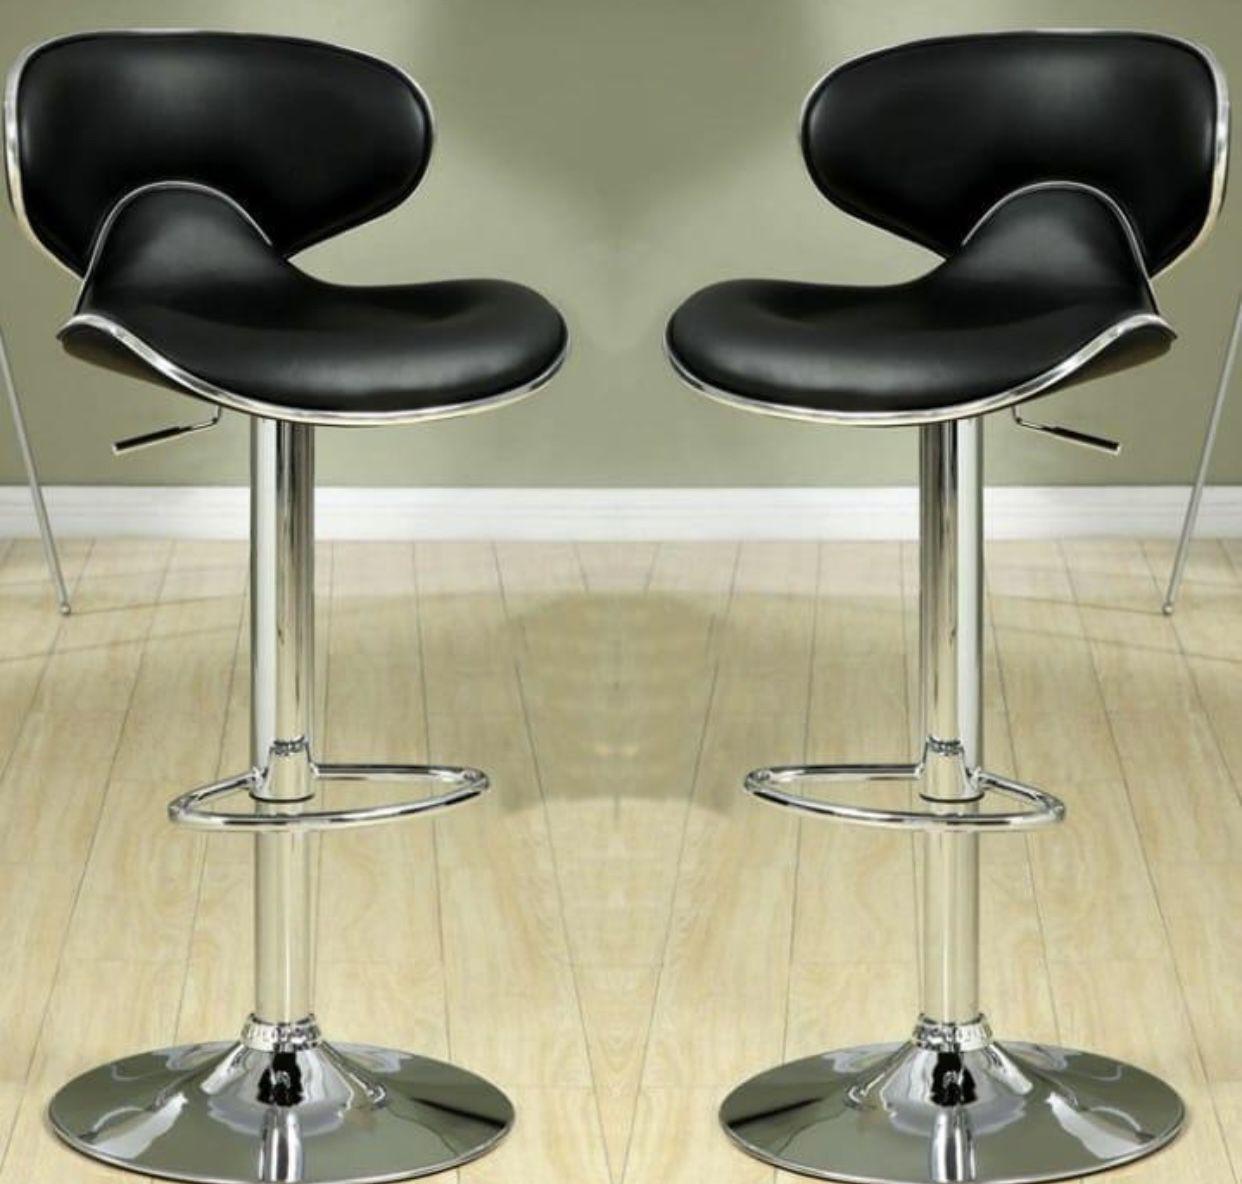 Brand new Adjustable Barstools, bar stools, barstool, bar stool in box $85 each.